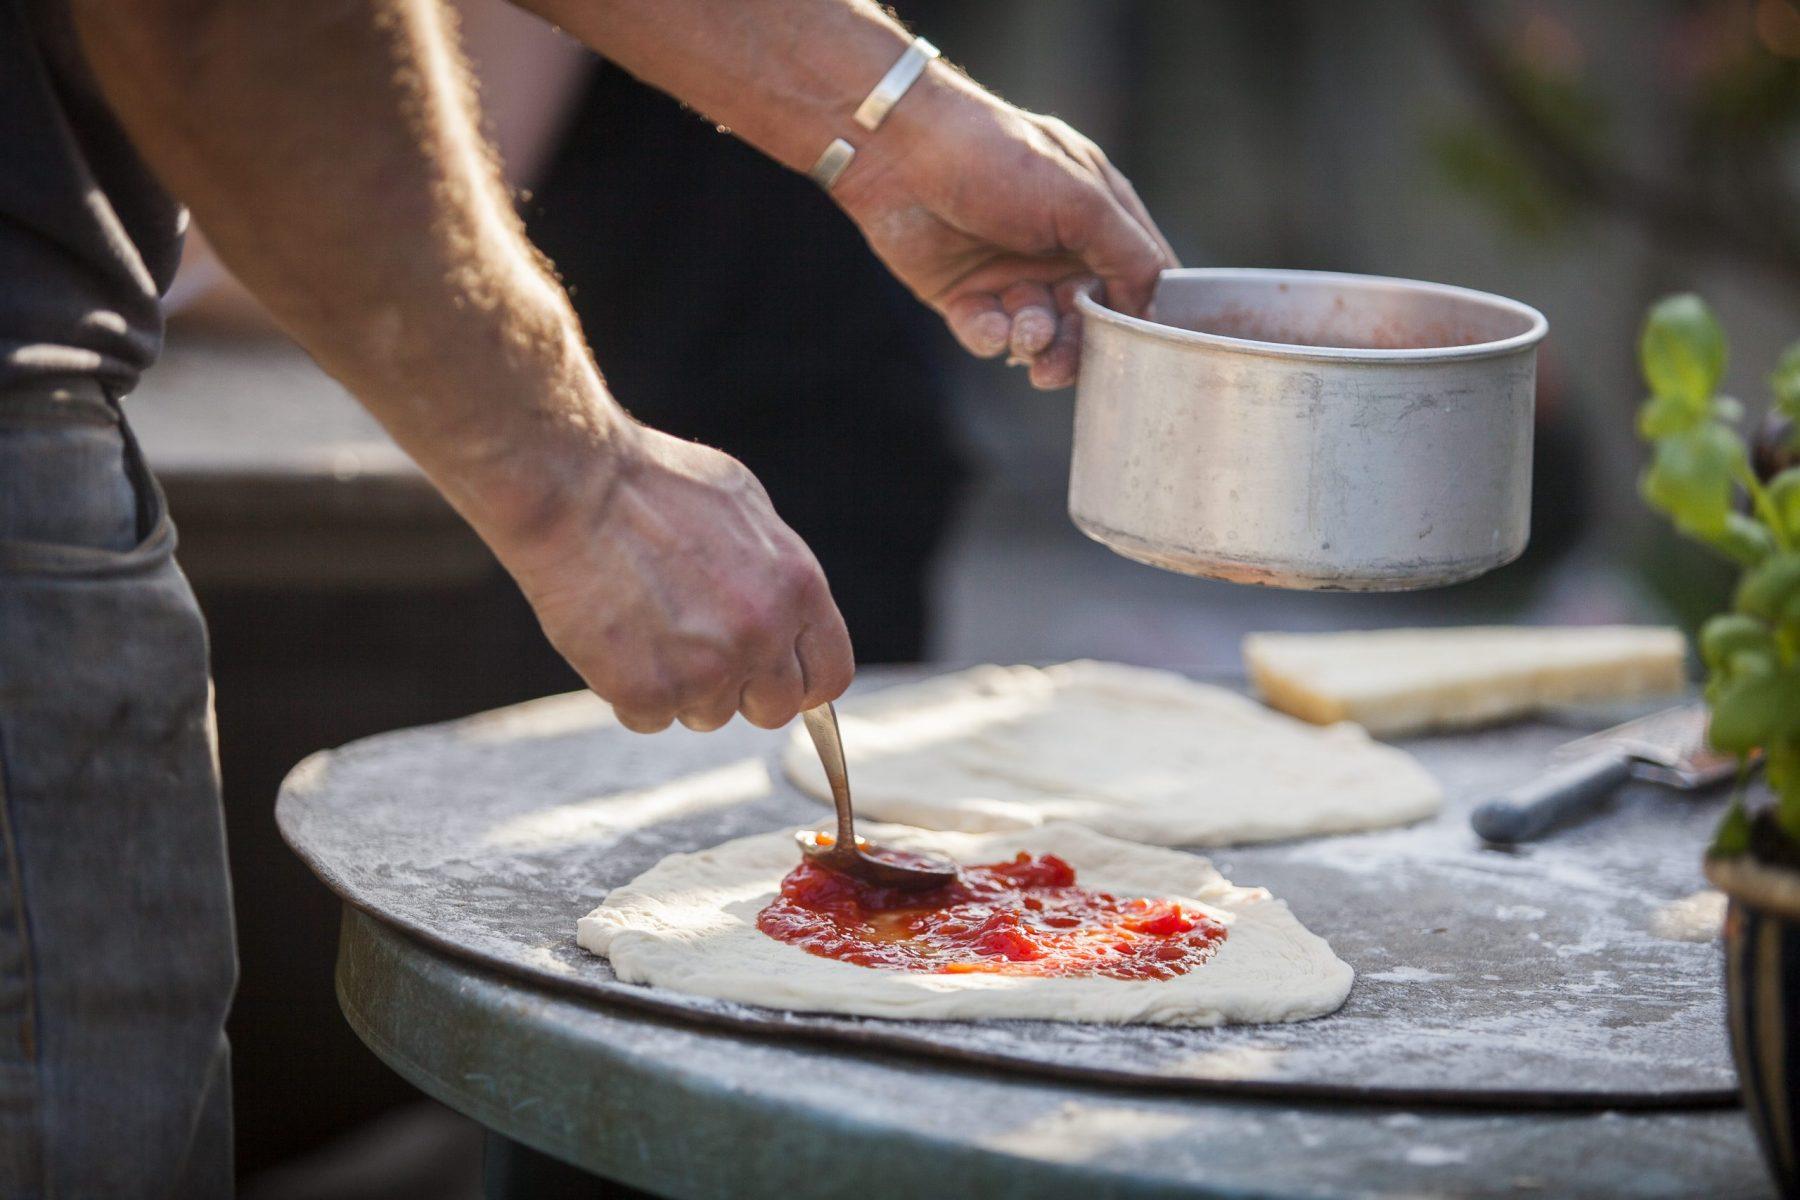 lage pizza ute i hagen